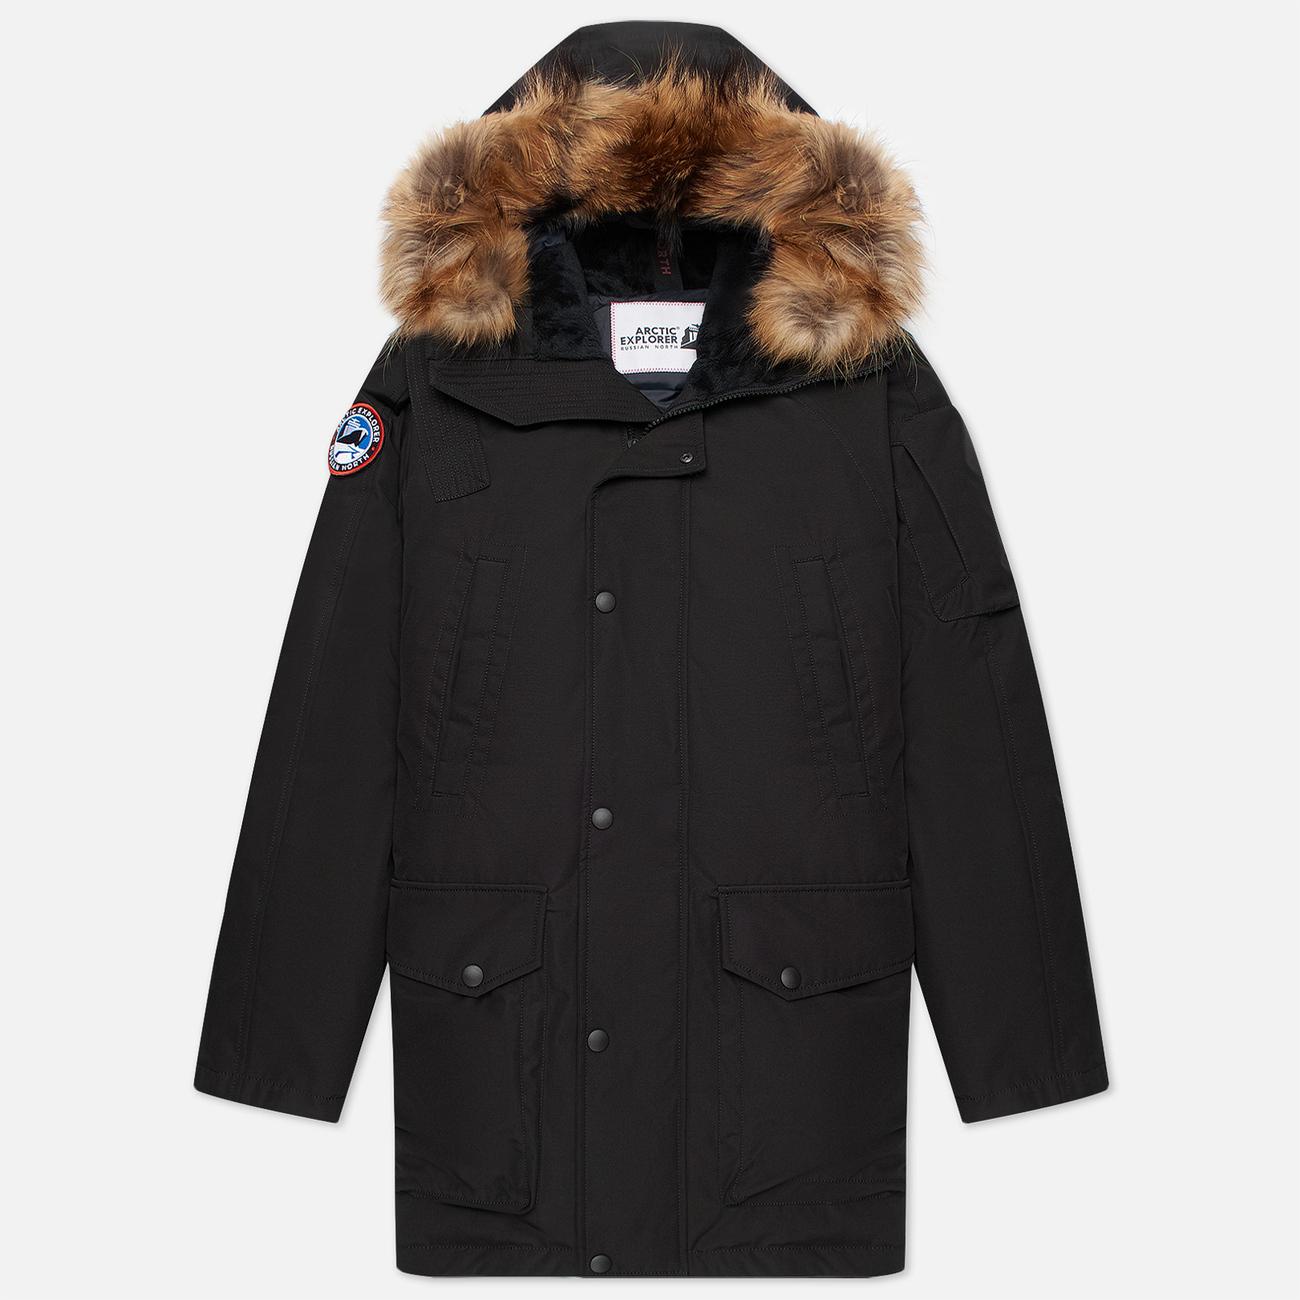 Мужская куртка парка Arctic Explorer MIR-1 Black